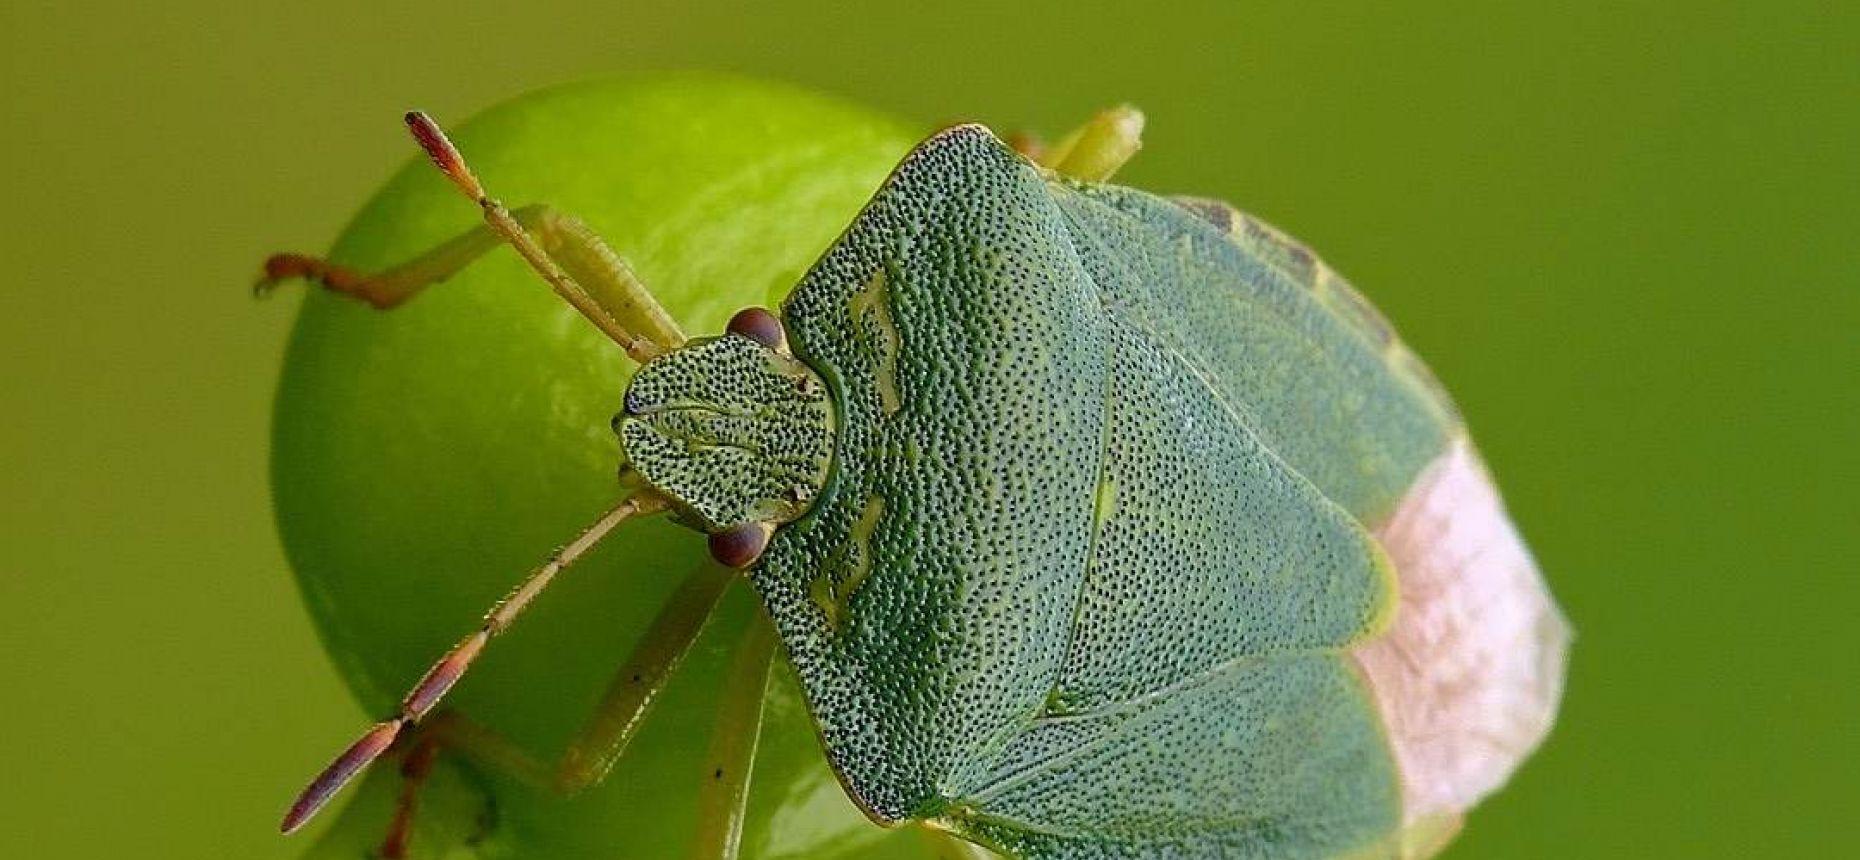 Щитник зелёный - Palomena prasina L.